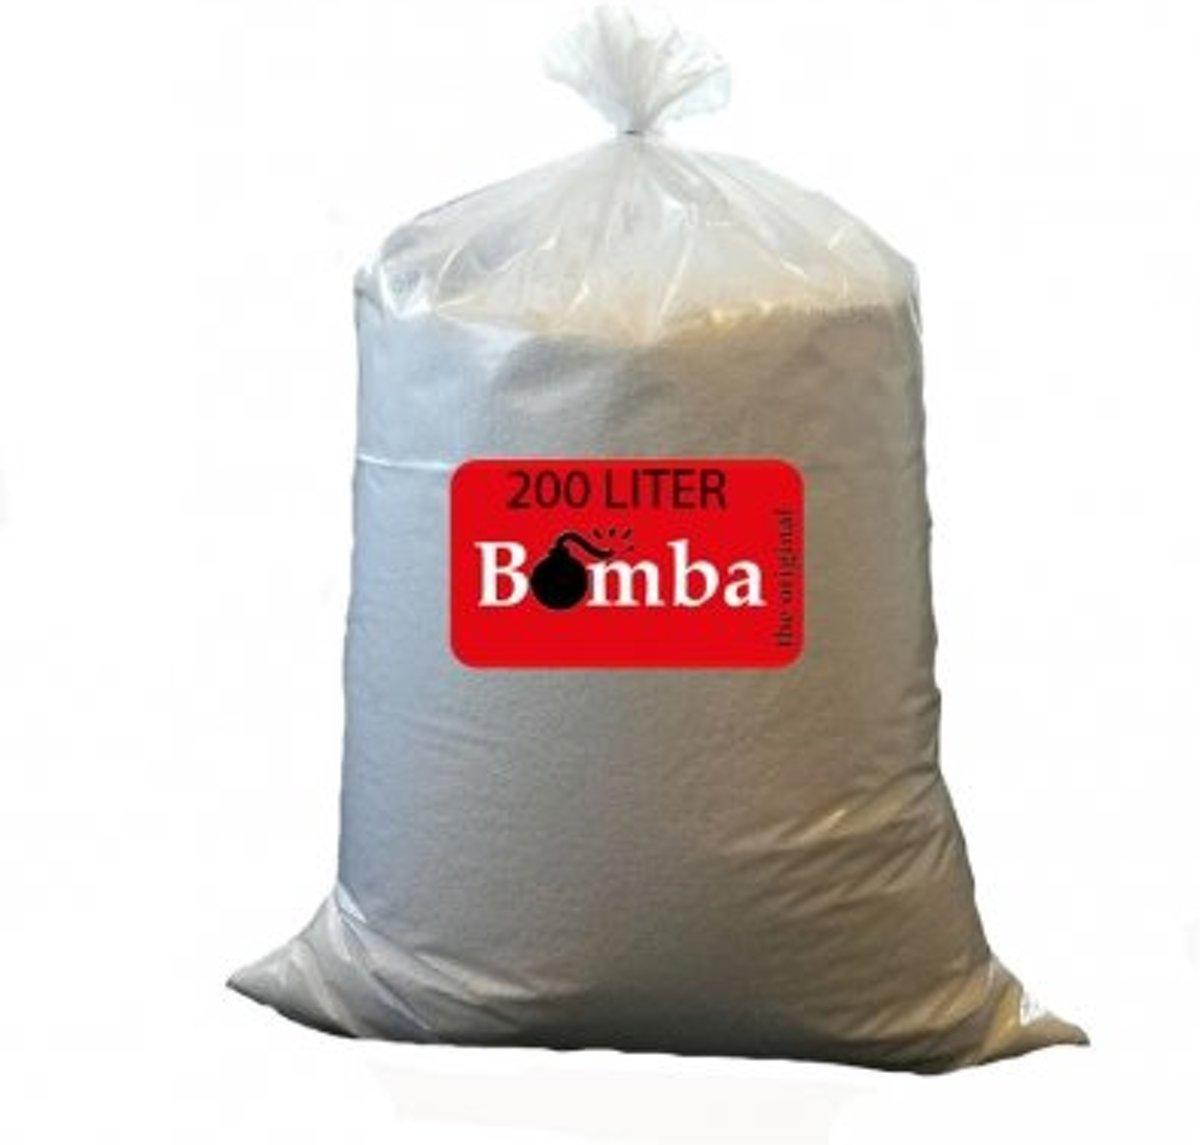 Bomba EPS zitzak vulling zitzakvulling 200 ltr. kopen